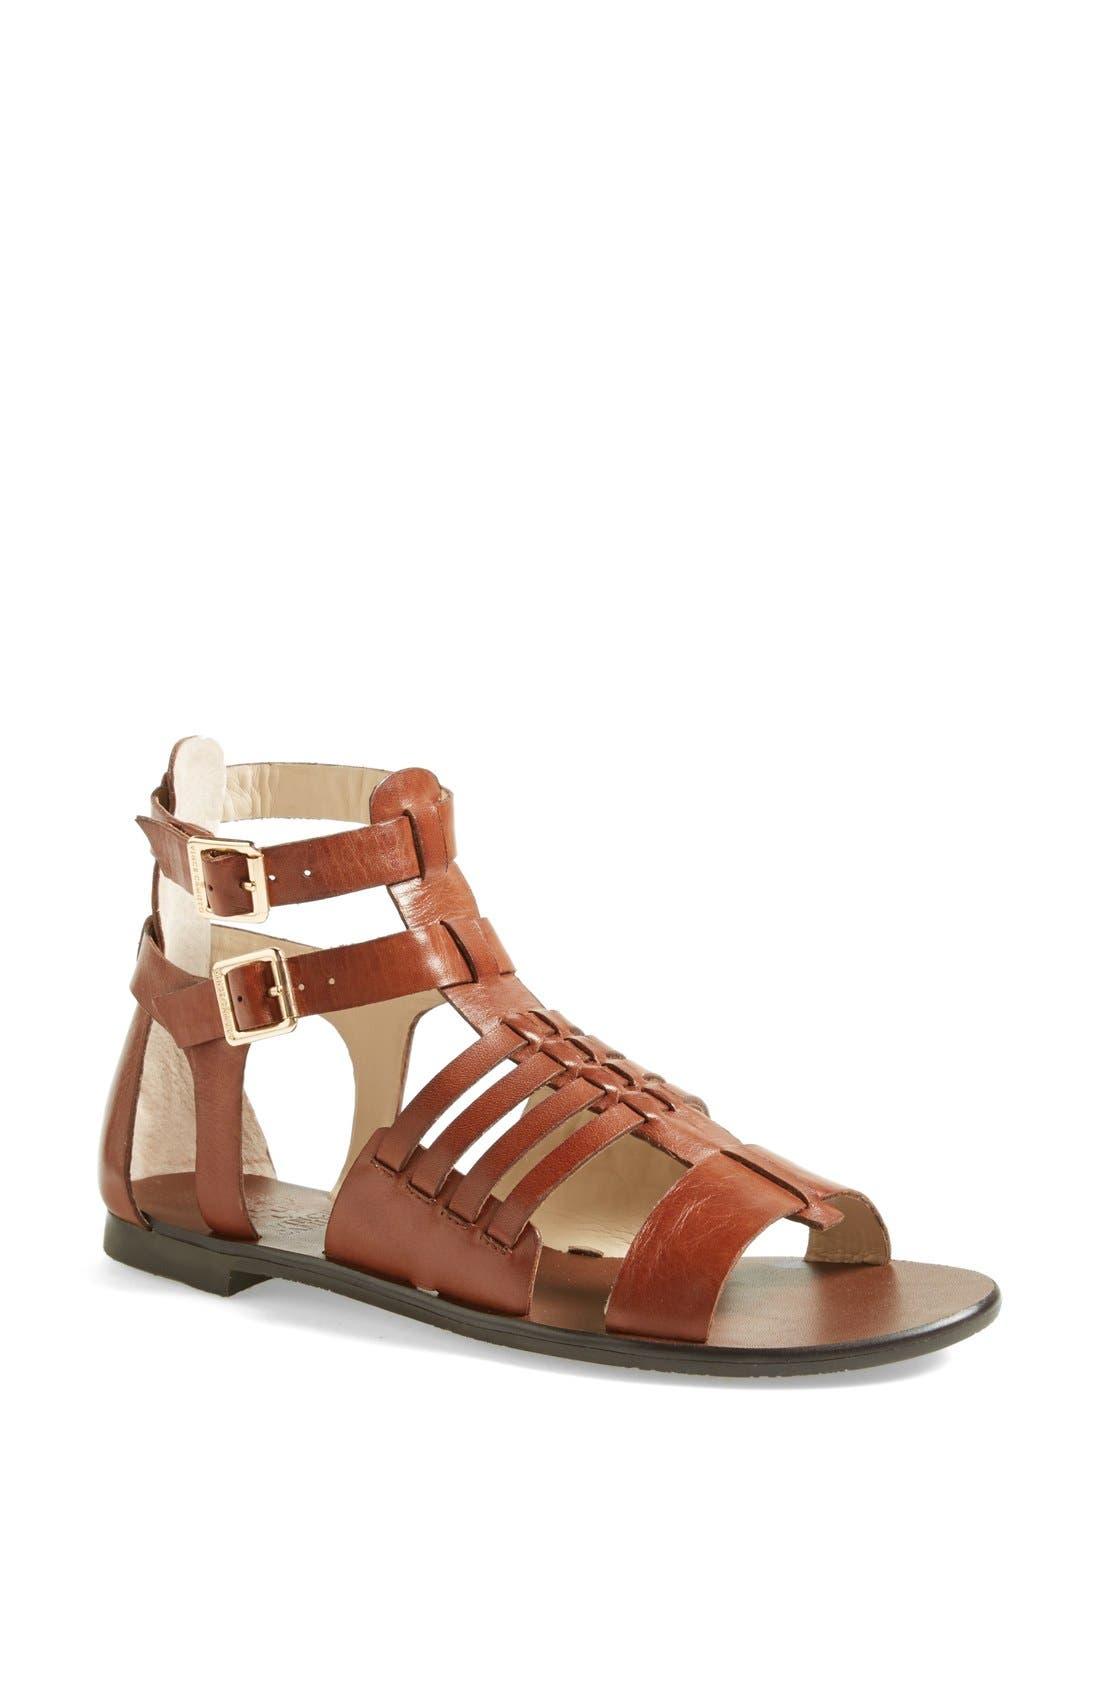 Main Image - Vince Camuto 'Jenorra' Sandal